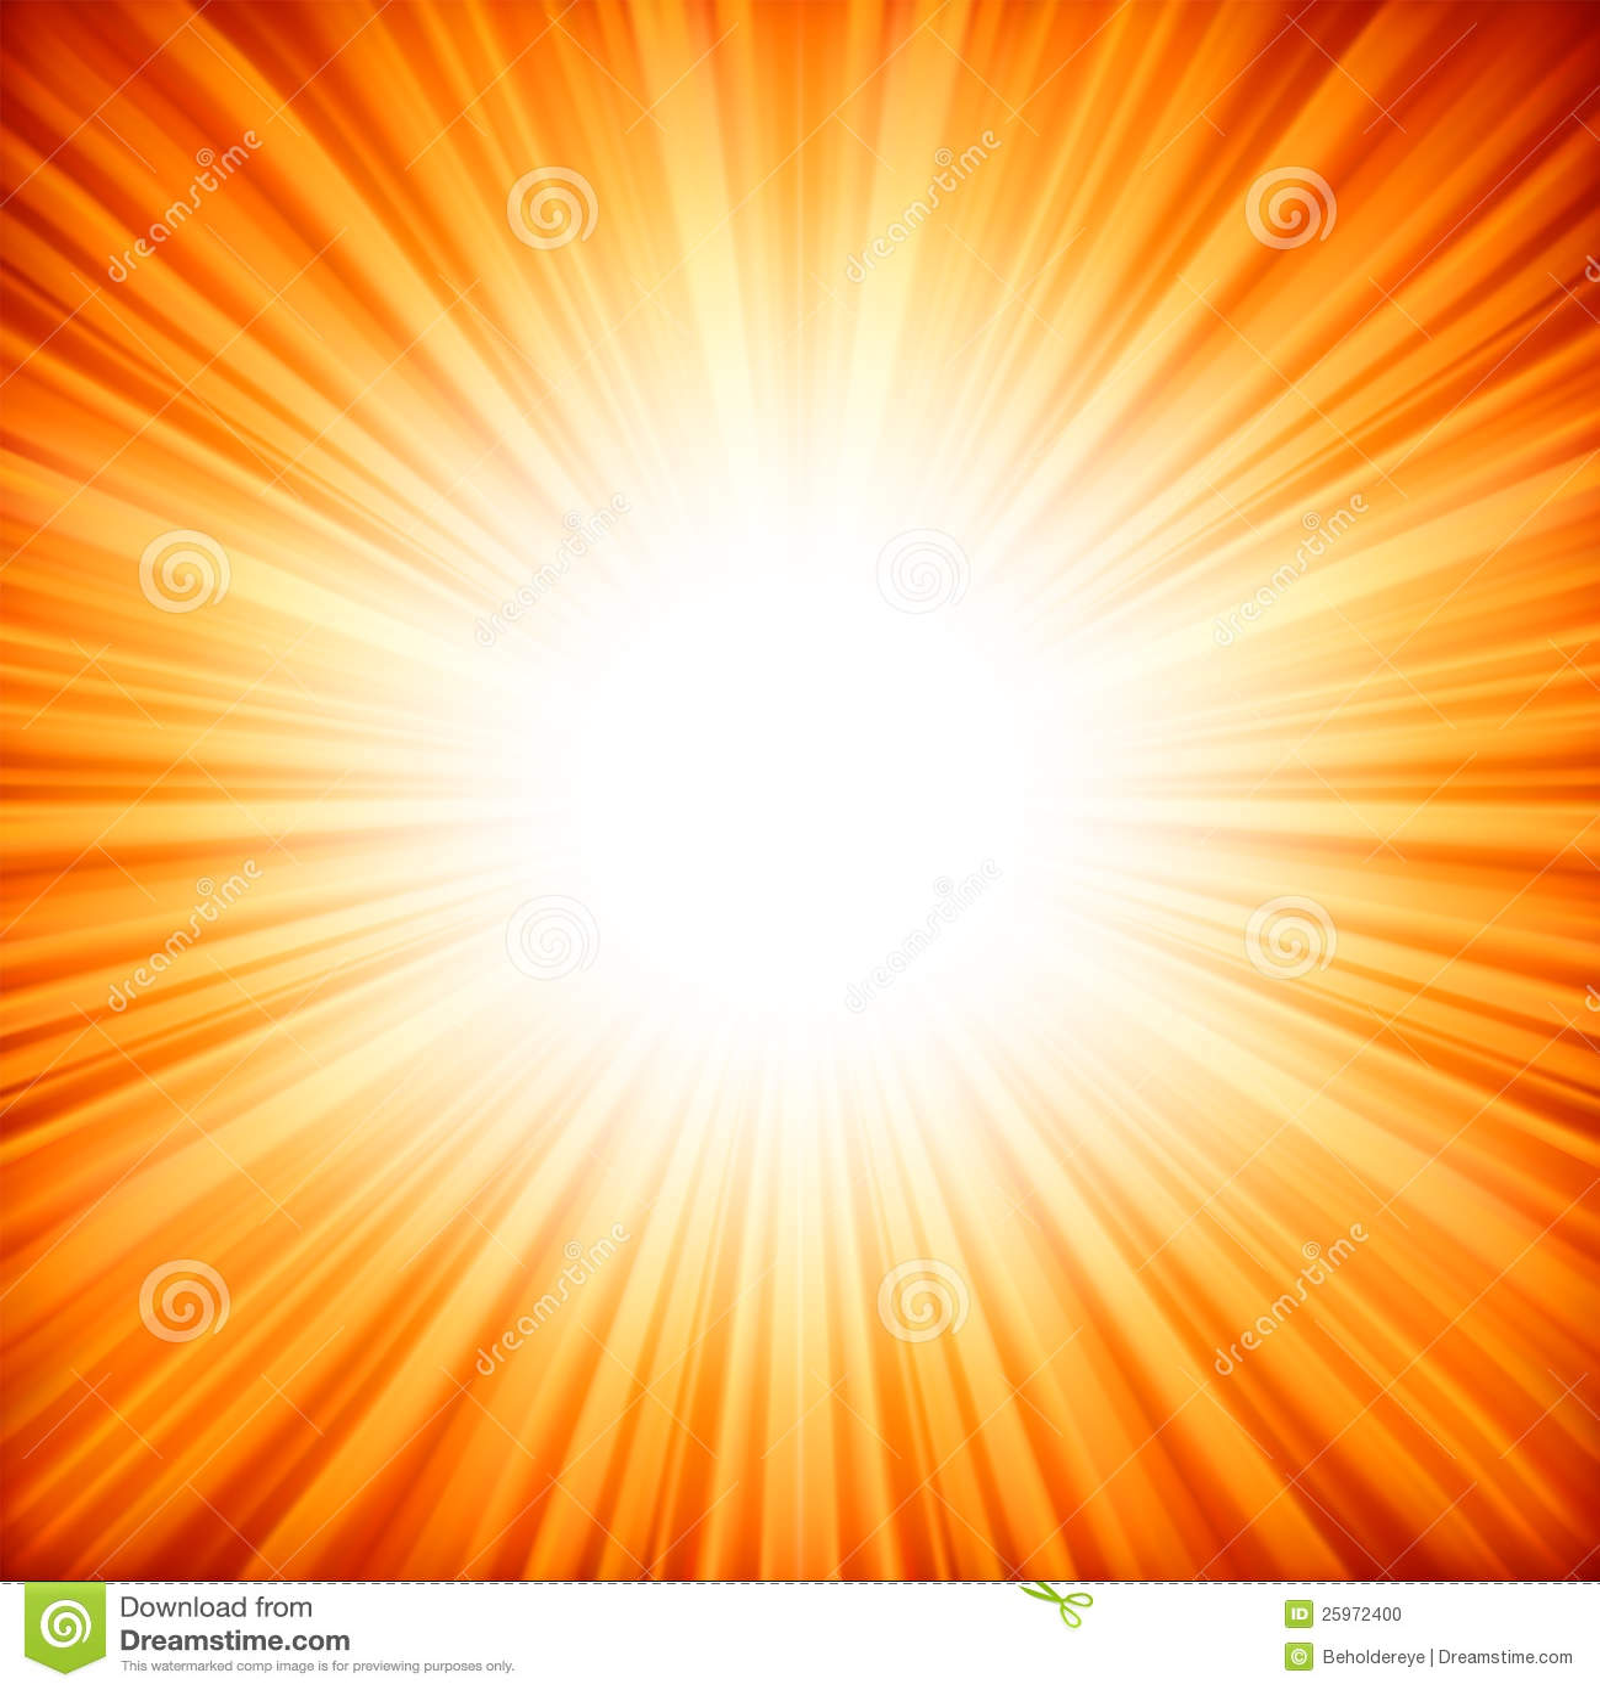 Radiant Star 24